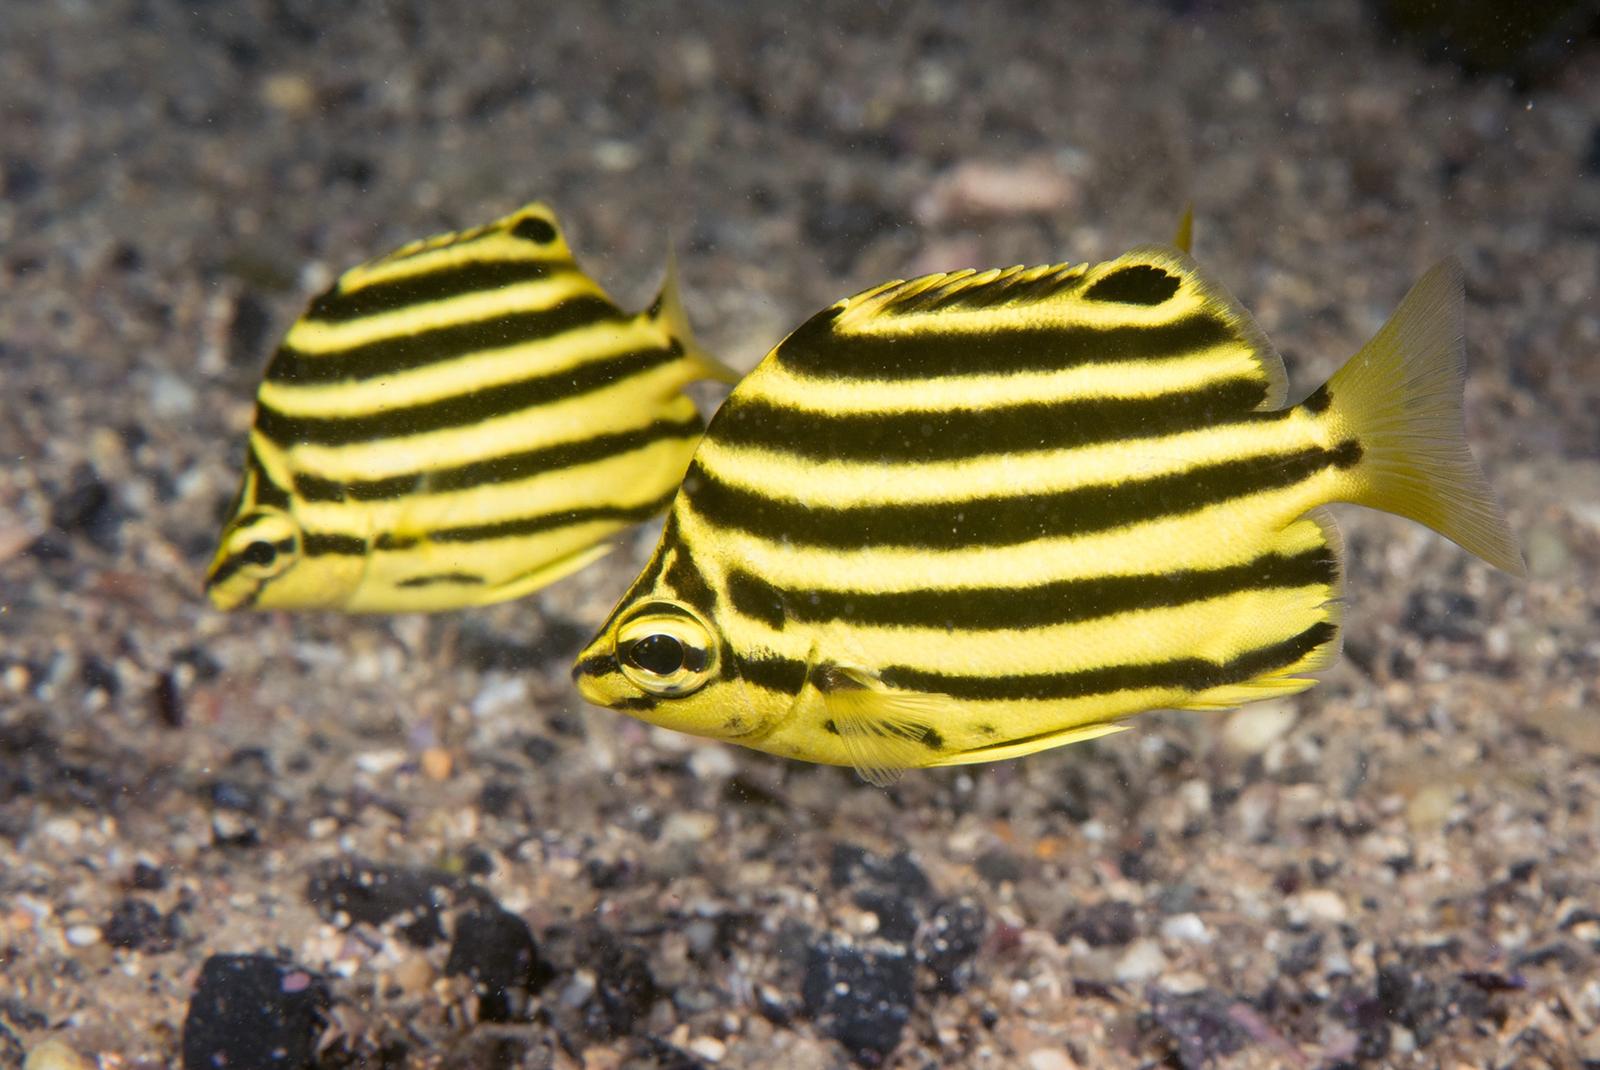 Juvenile Microcanthus strigatus